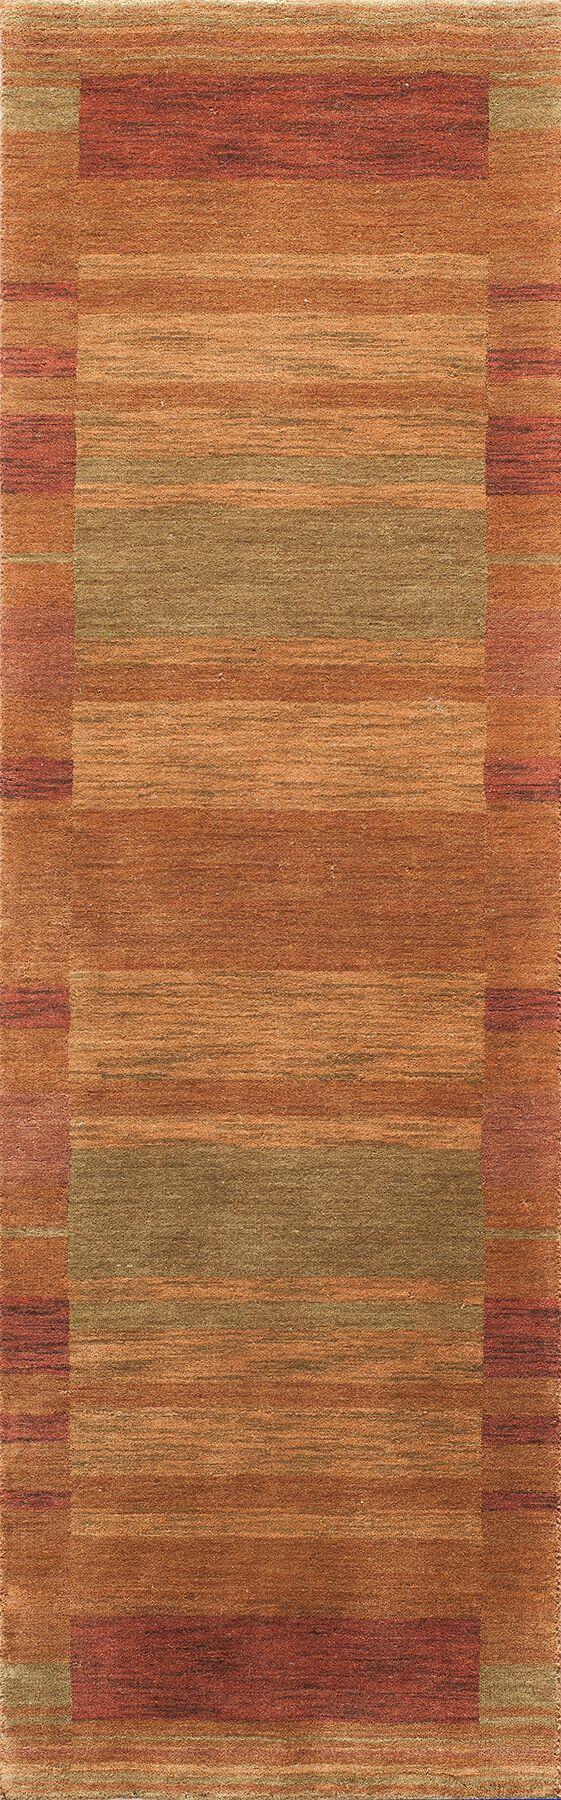 Donaghy Hand-Woven Rust/Light Green Area Rug Rug Size: Rectangle 7'6